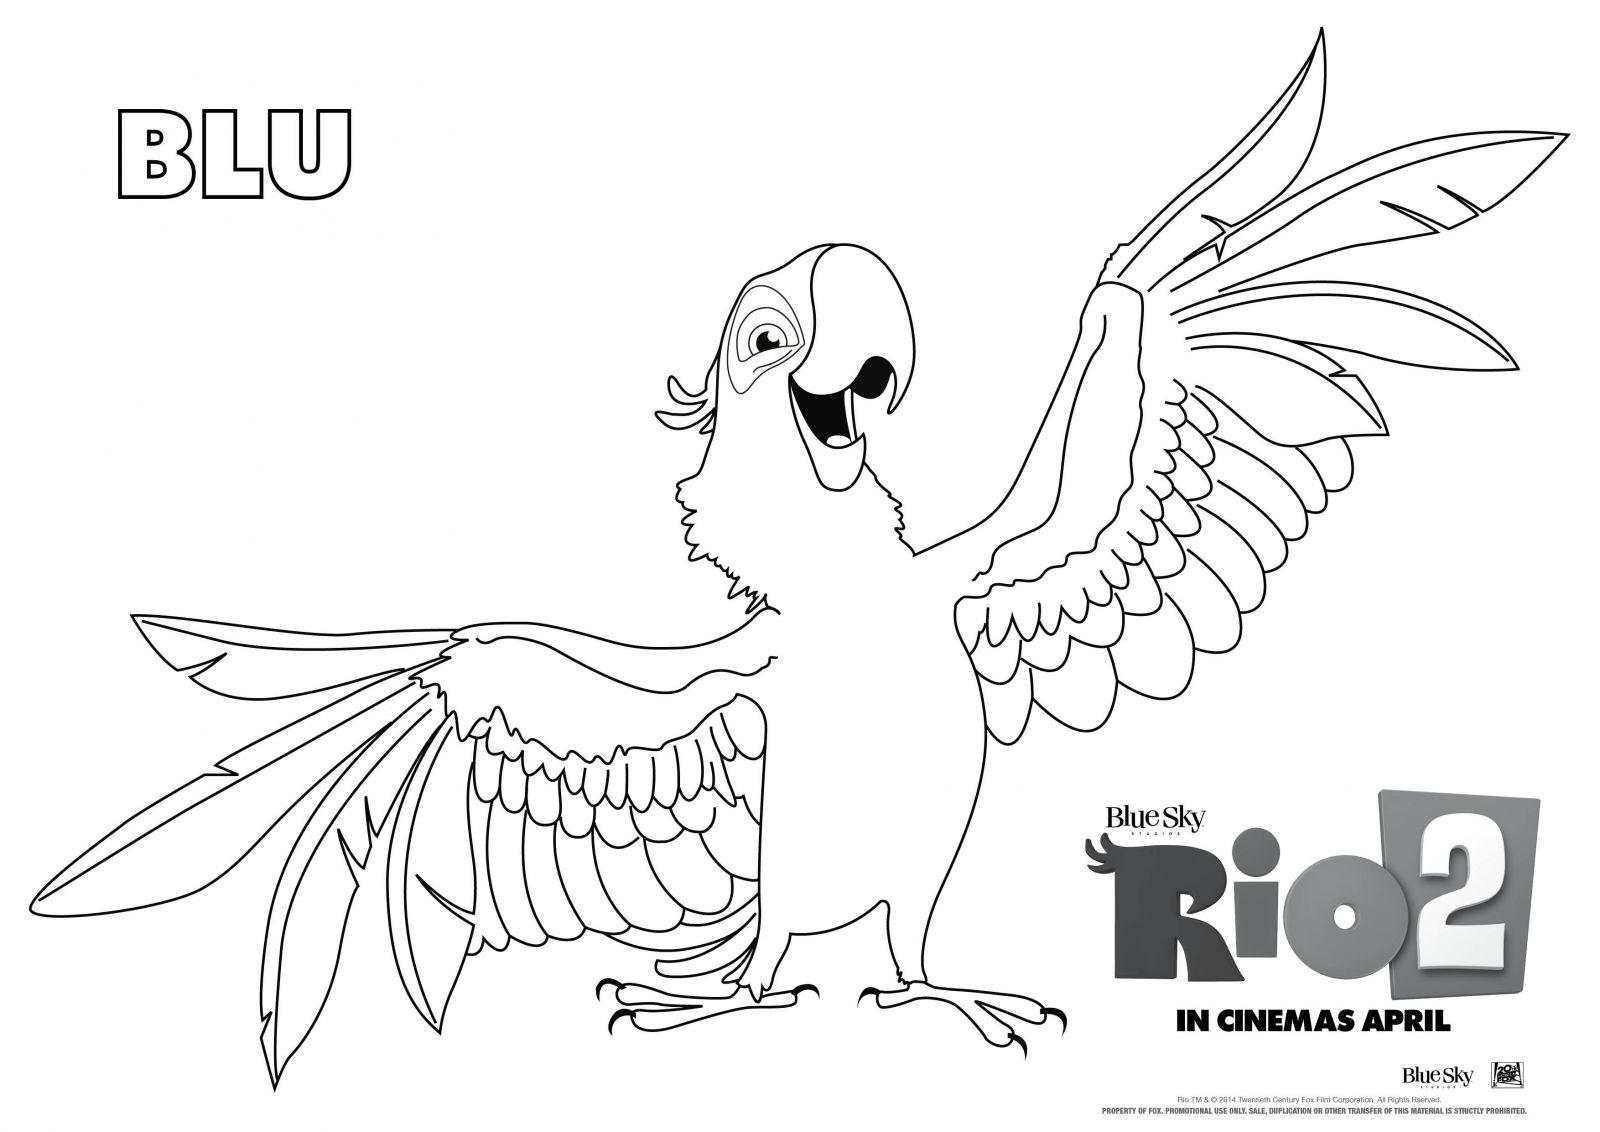 fun rio 2 colour activity sheets - Fun Pictures To Colour In 2